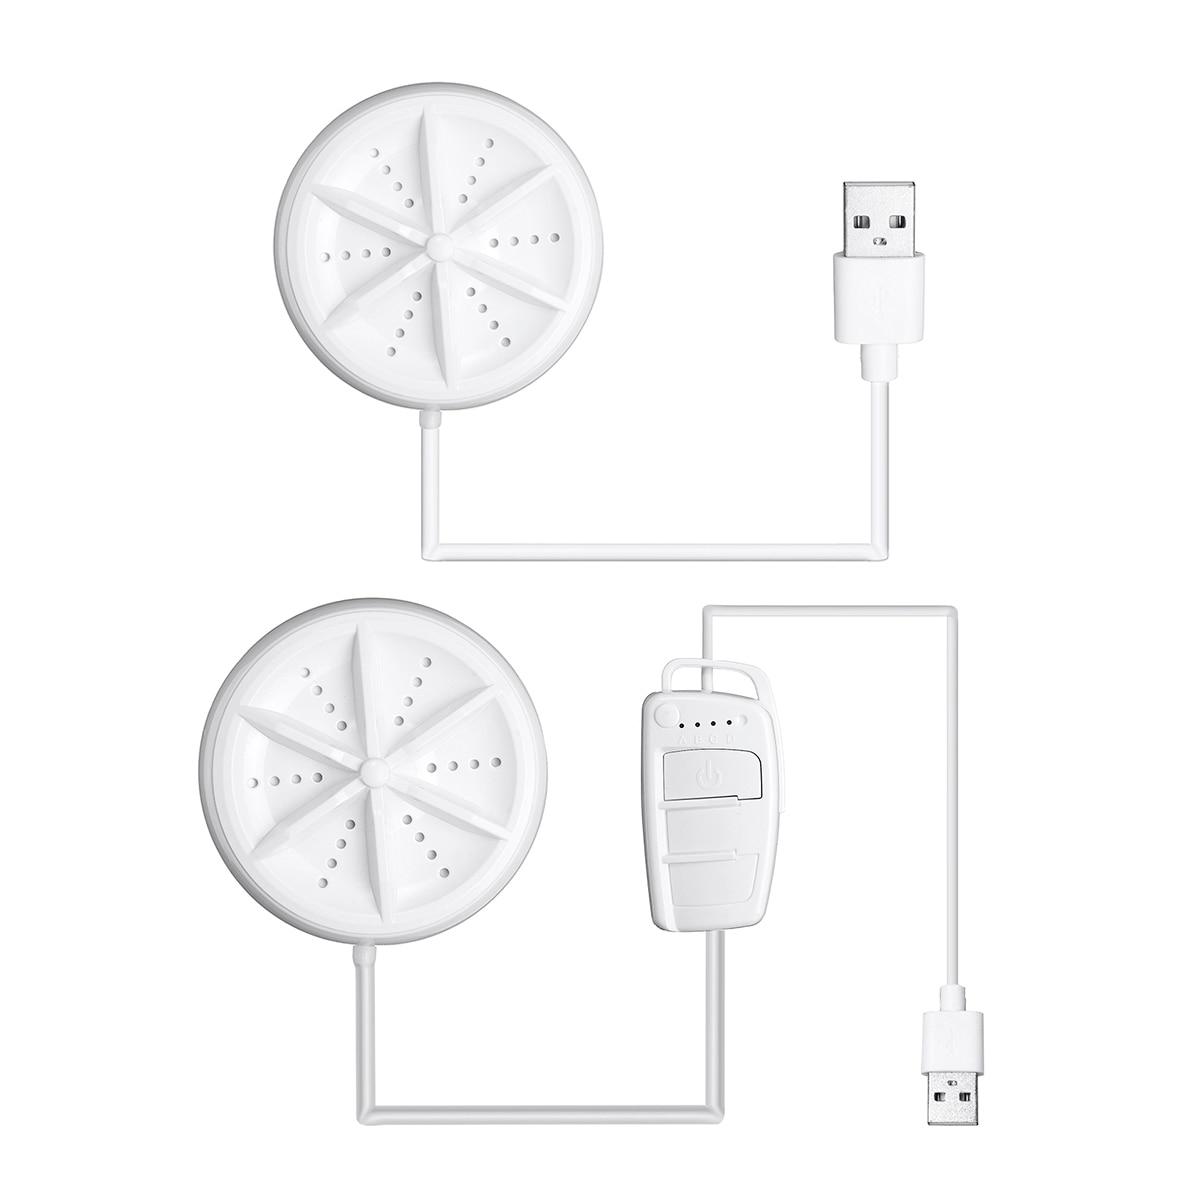 6W 10V Mini Ultrasonic Turbo Washing Machine Portable Personal Rotating Washer Convenient For Travel Home Business Trip USB